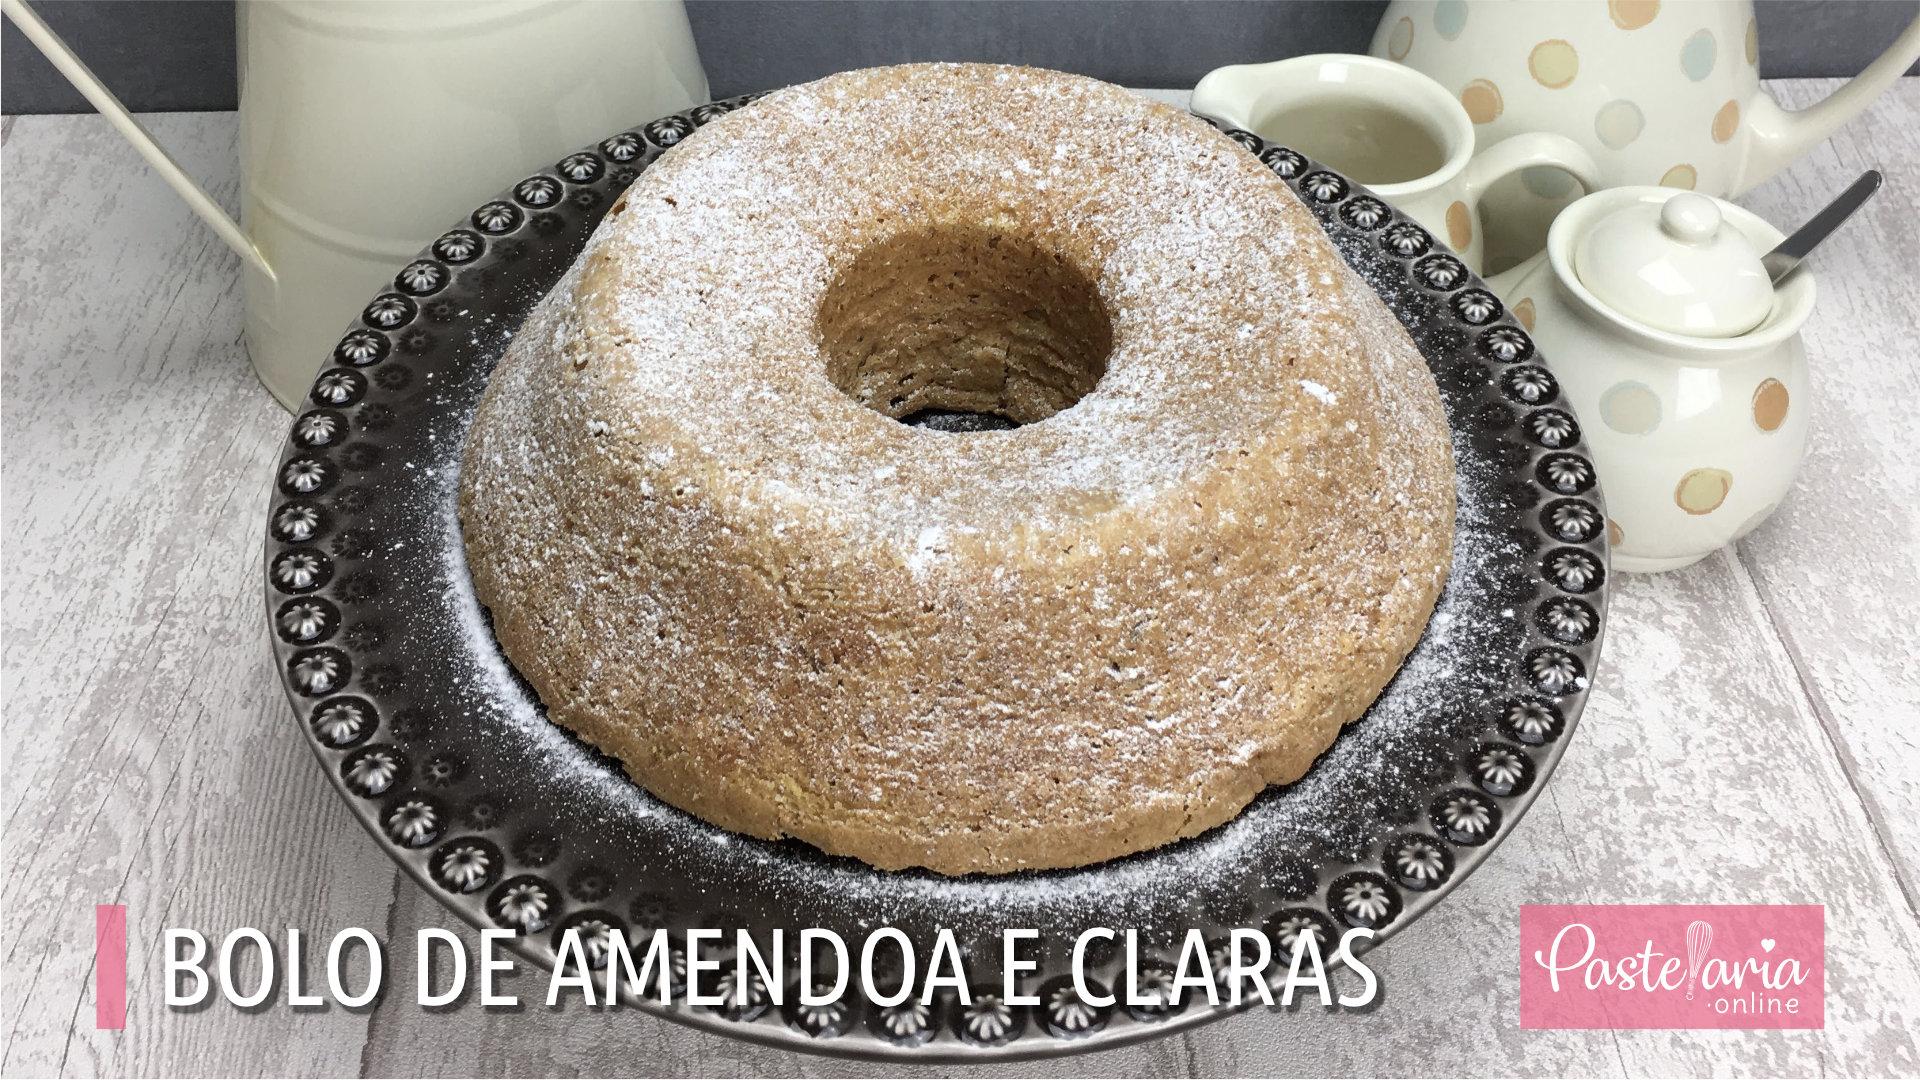 Video do bolo de amendoa e claras